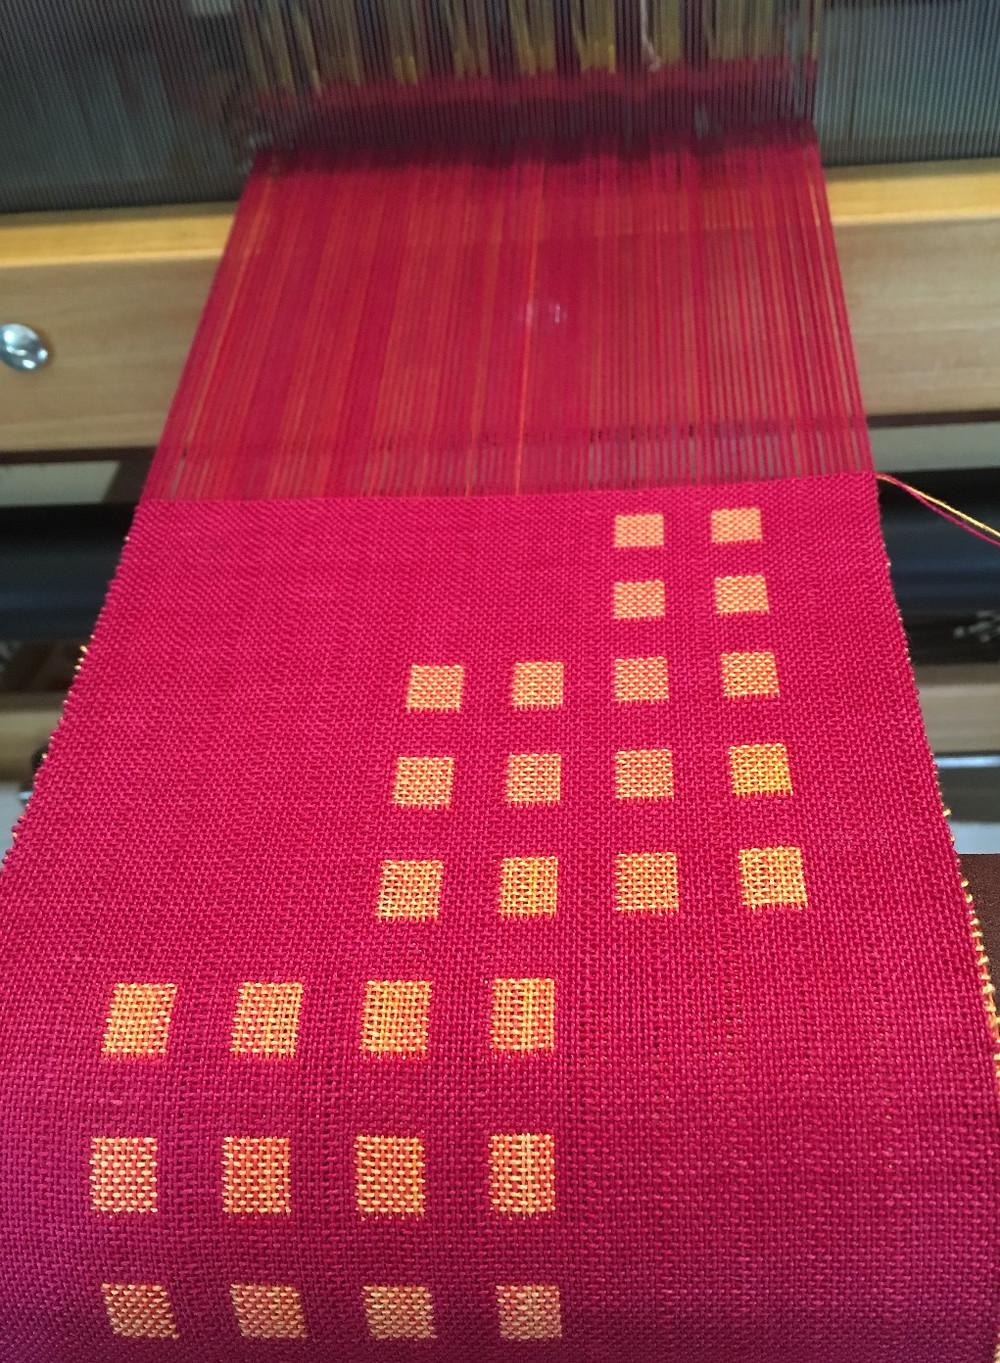 Weaving on the loom.